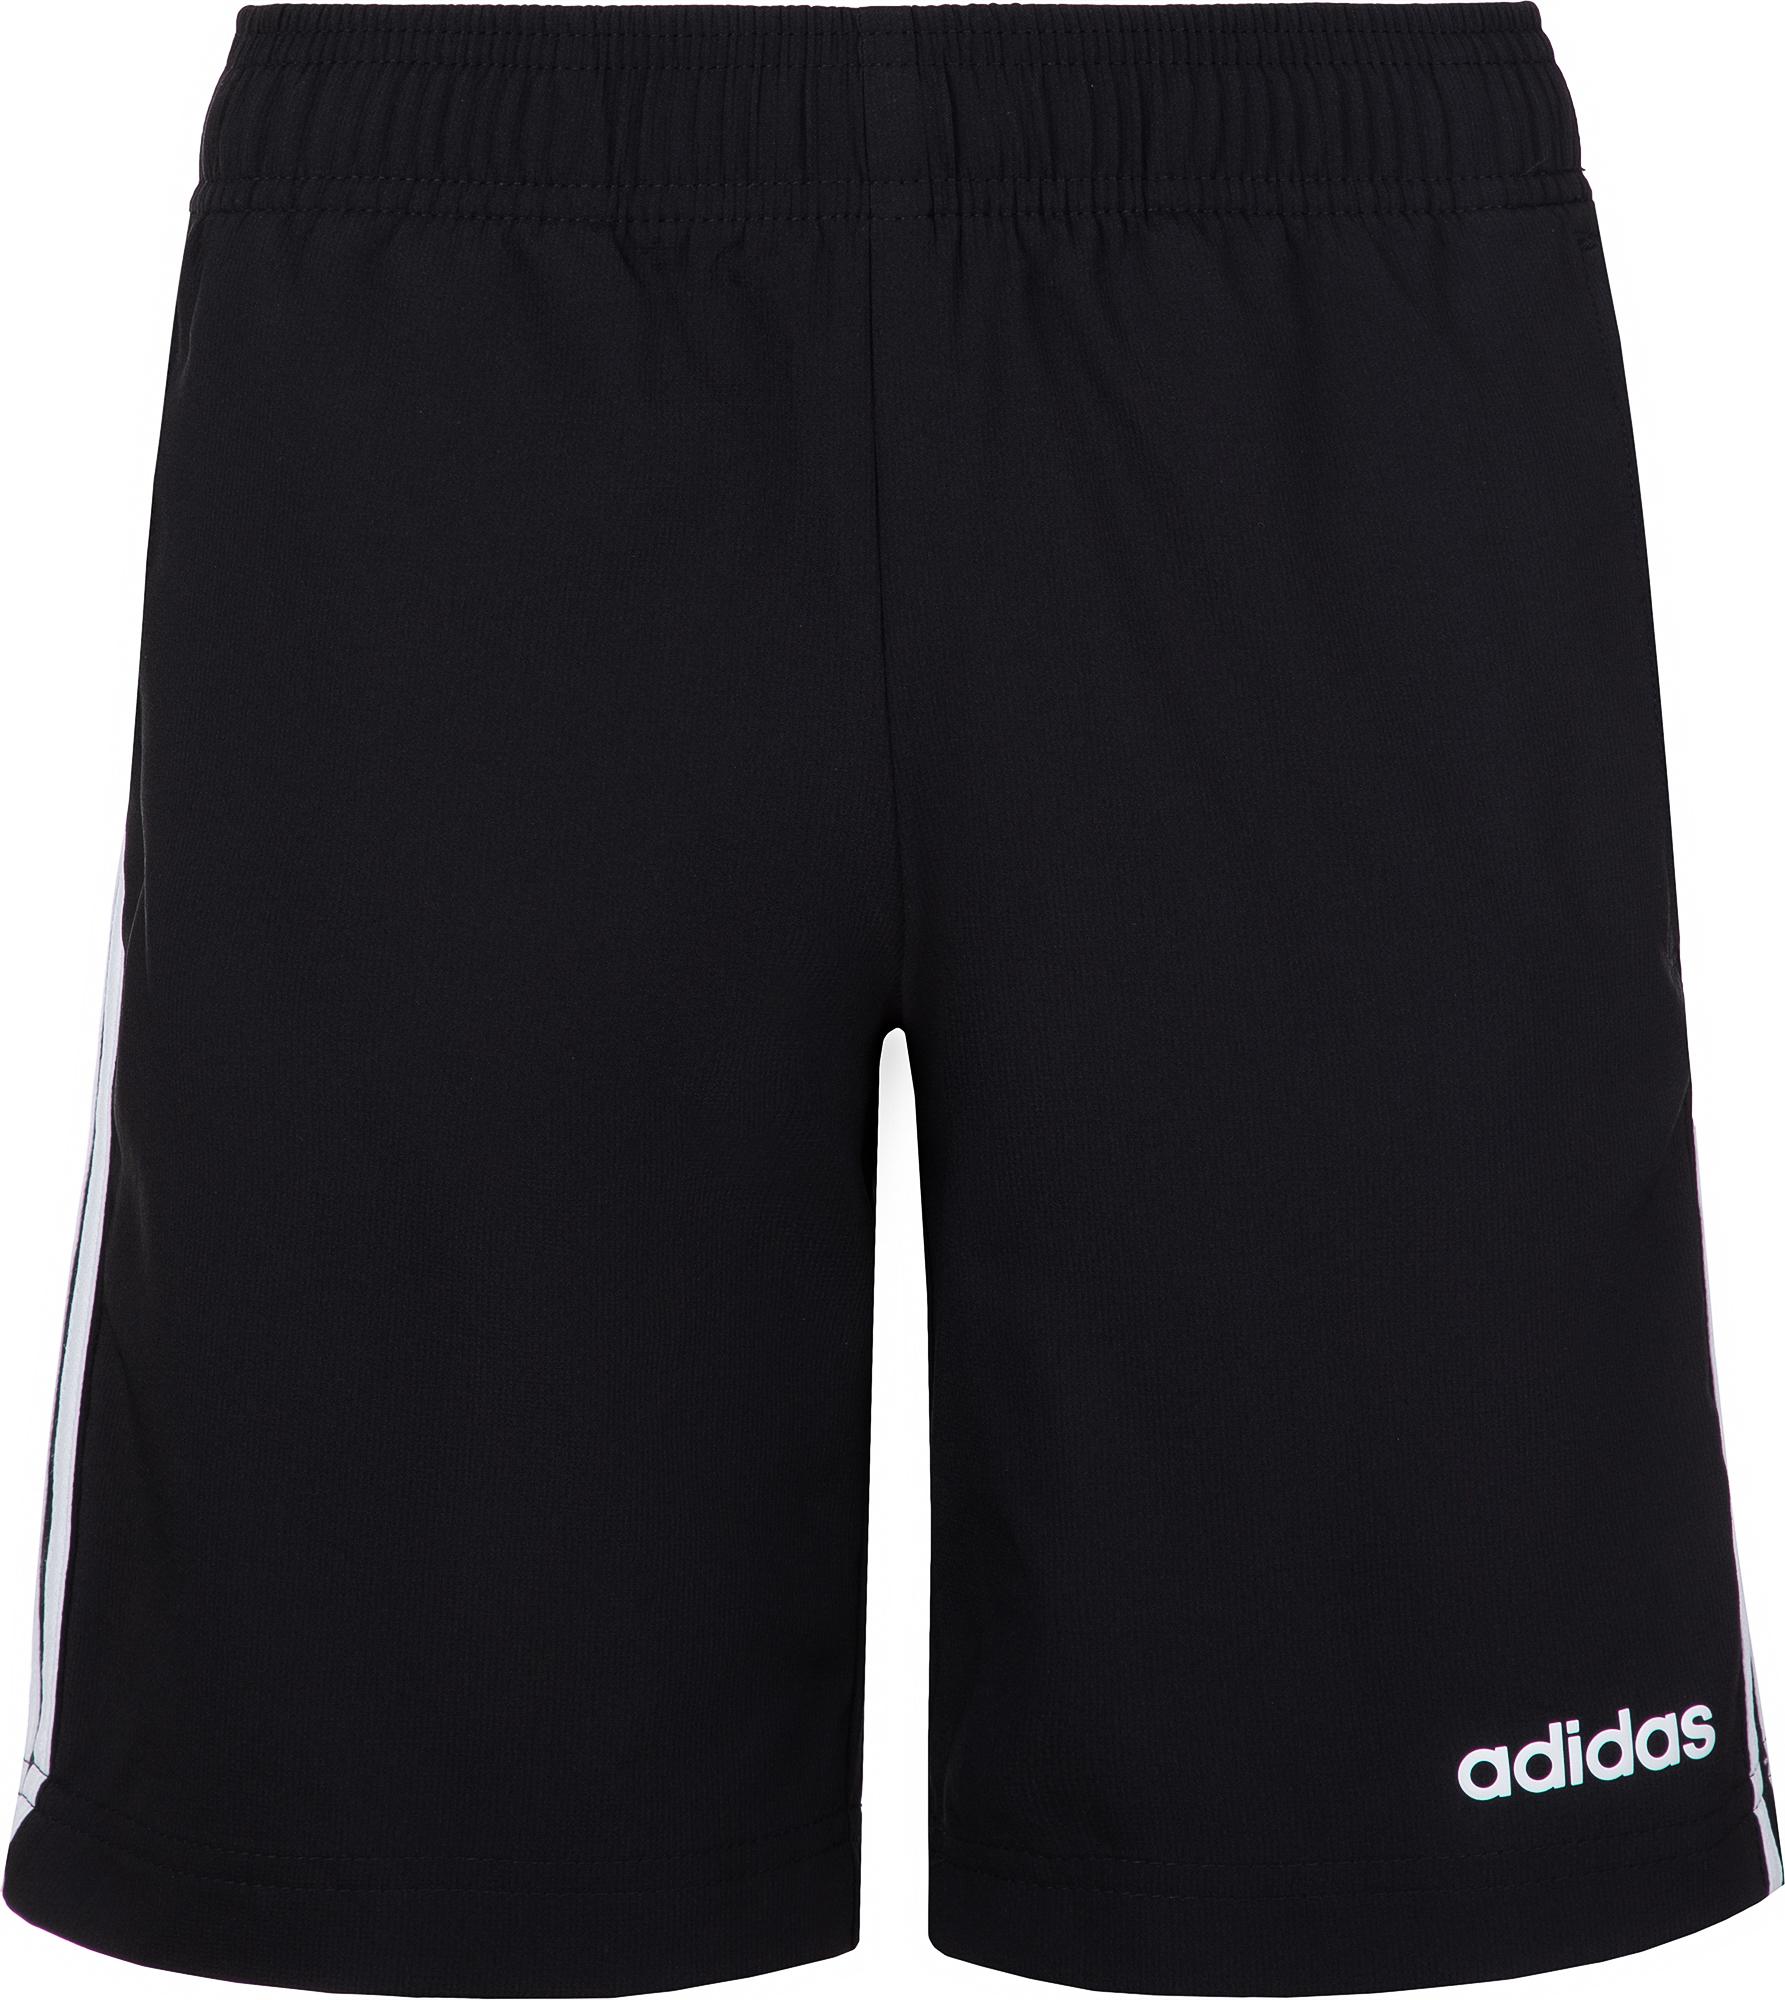 Adidas Шорты для мальчиков Adidas Essentials 3-Stripes, размер 164 шорты для мальчика adidas tiro17 wov shoy цвет черный ay2892 размер 128